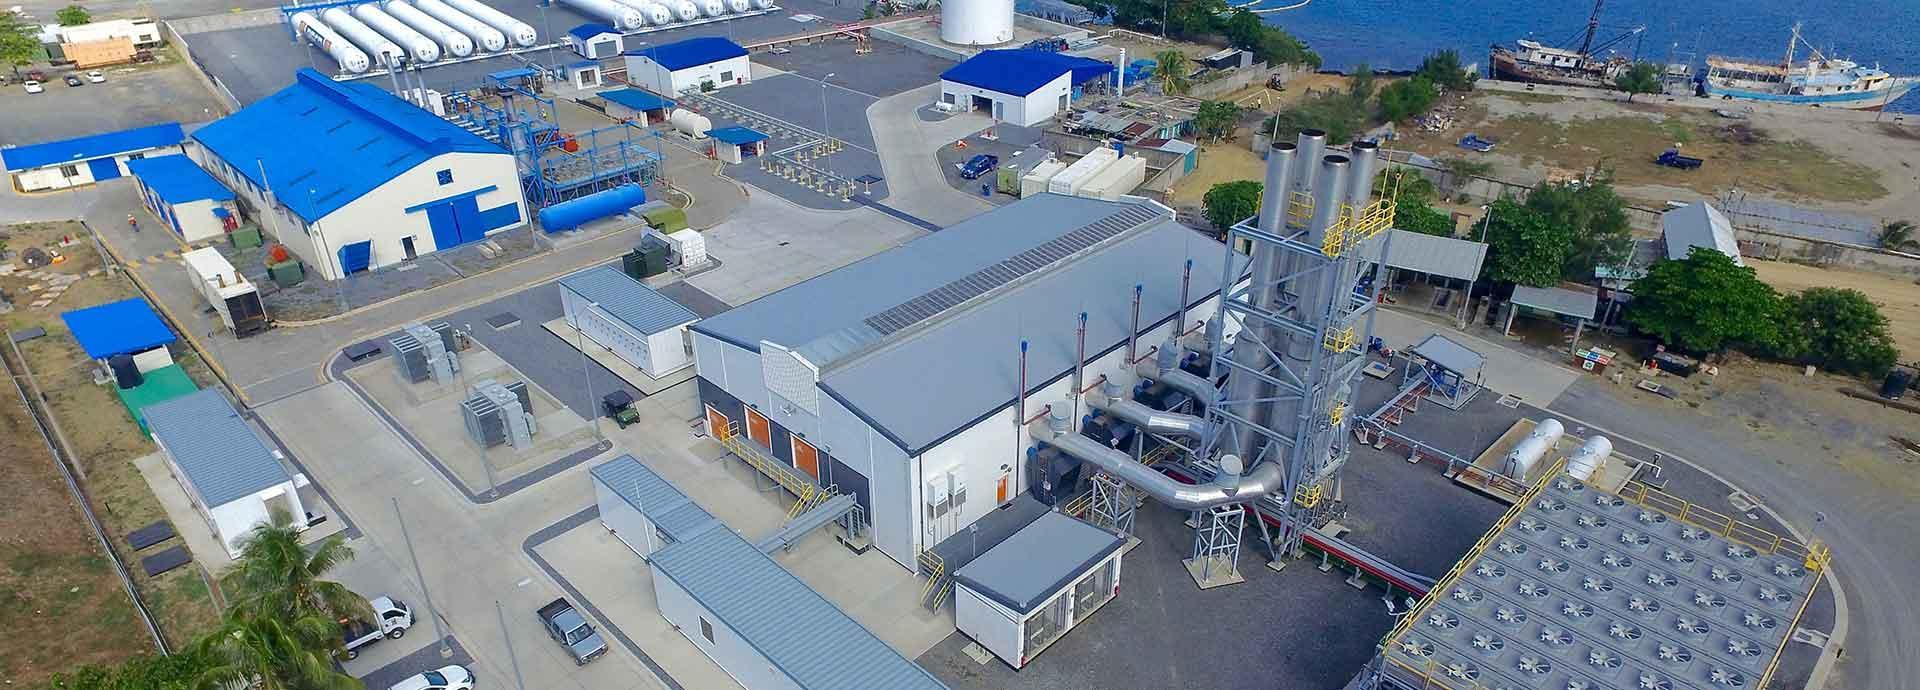 LPG – Taking fuel flexibility to the next level